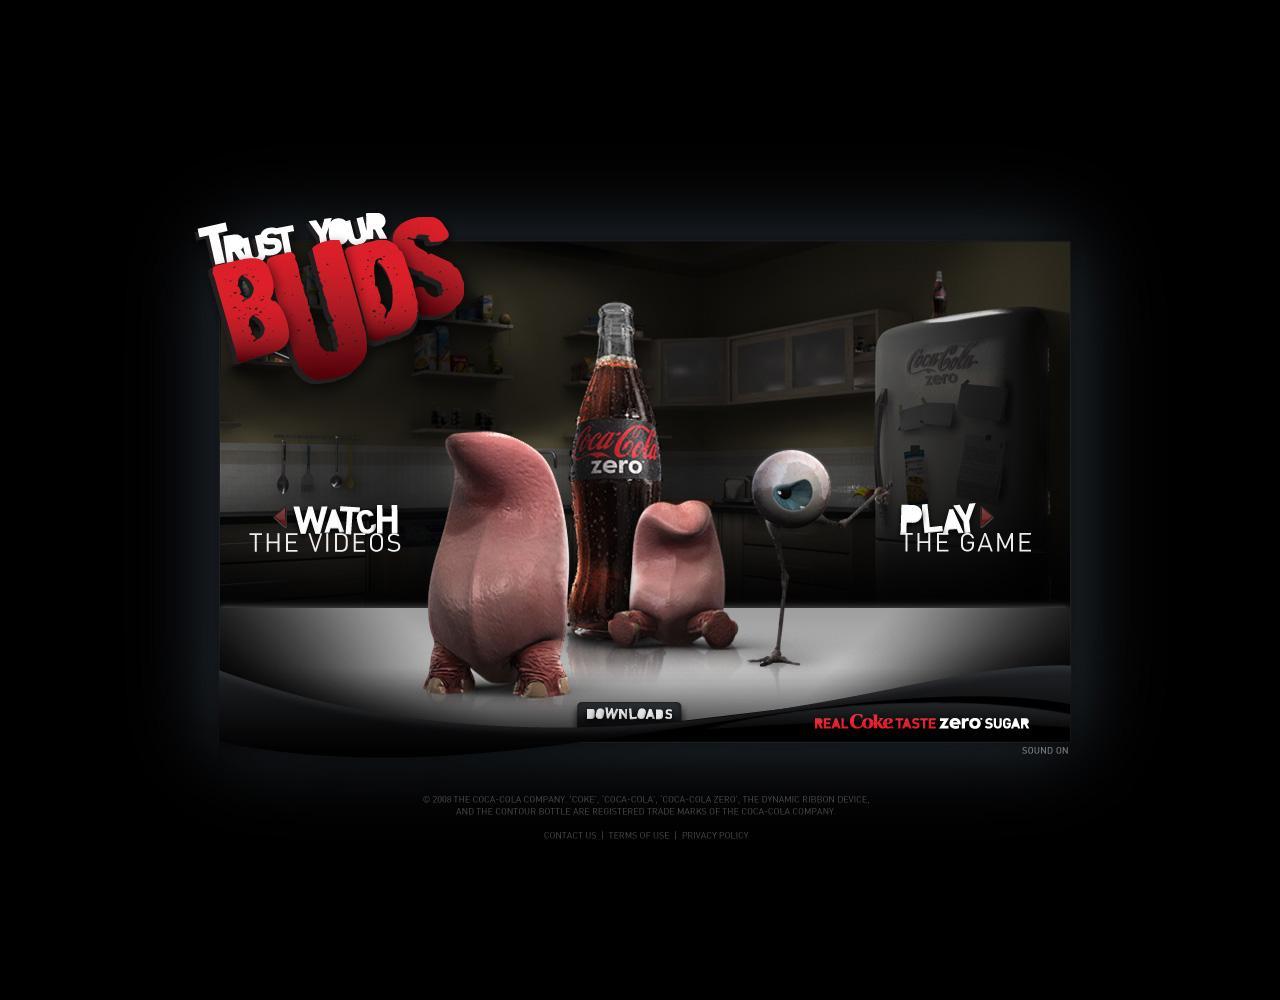 Coca-Cola Zero Digital Ad -  Trust your buds